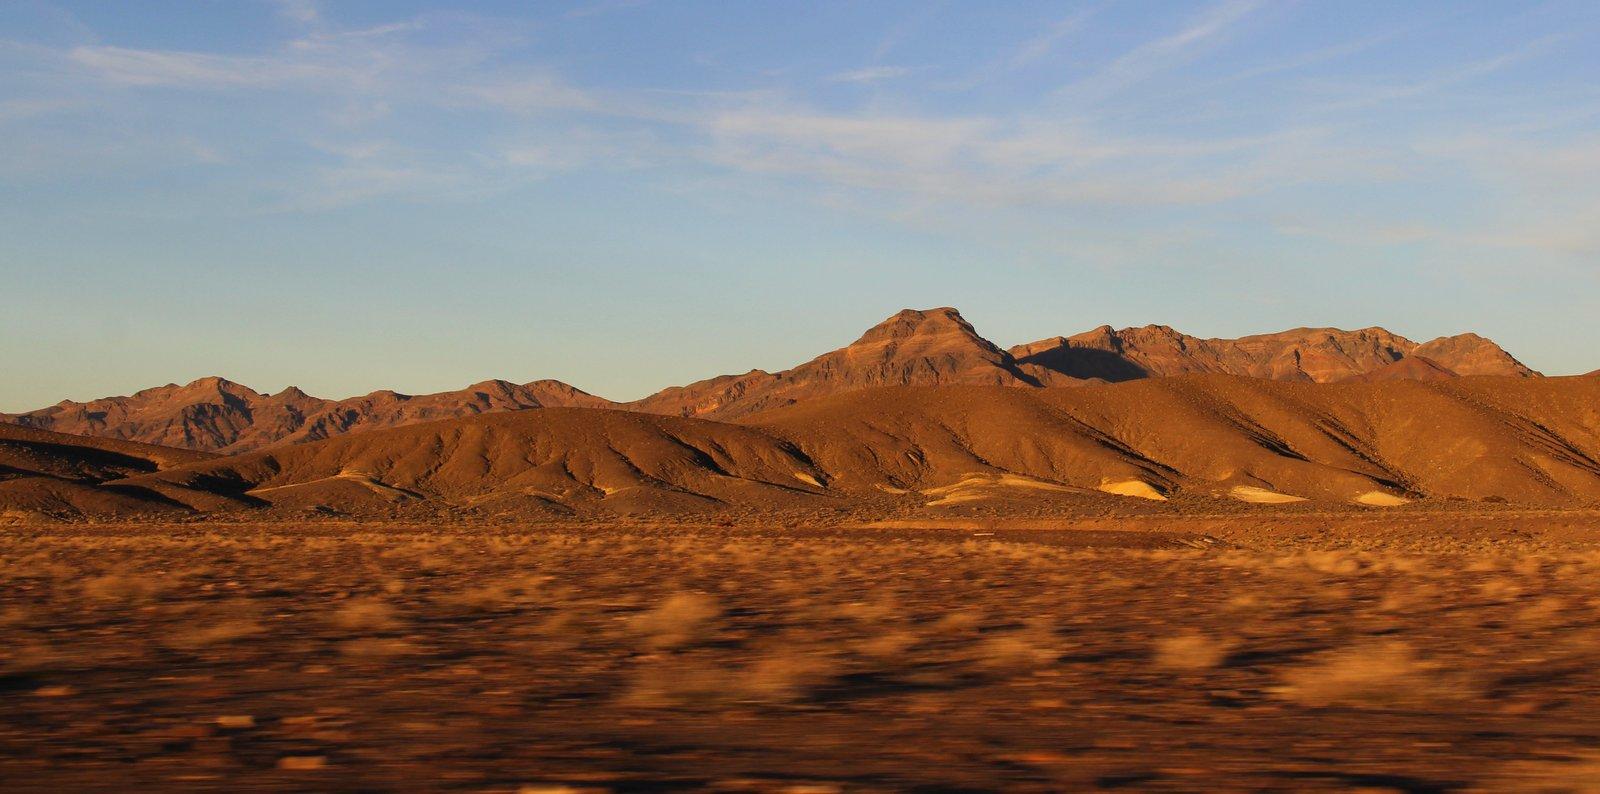 Dolina_Smierci_Death_Valley_Nevada_photo_photo_2425